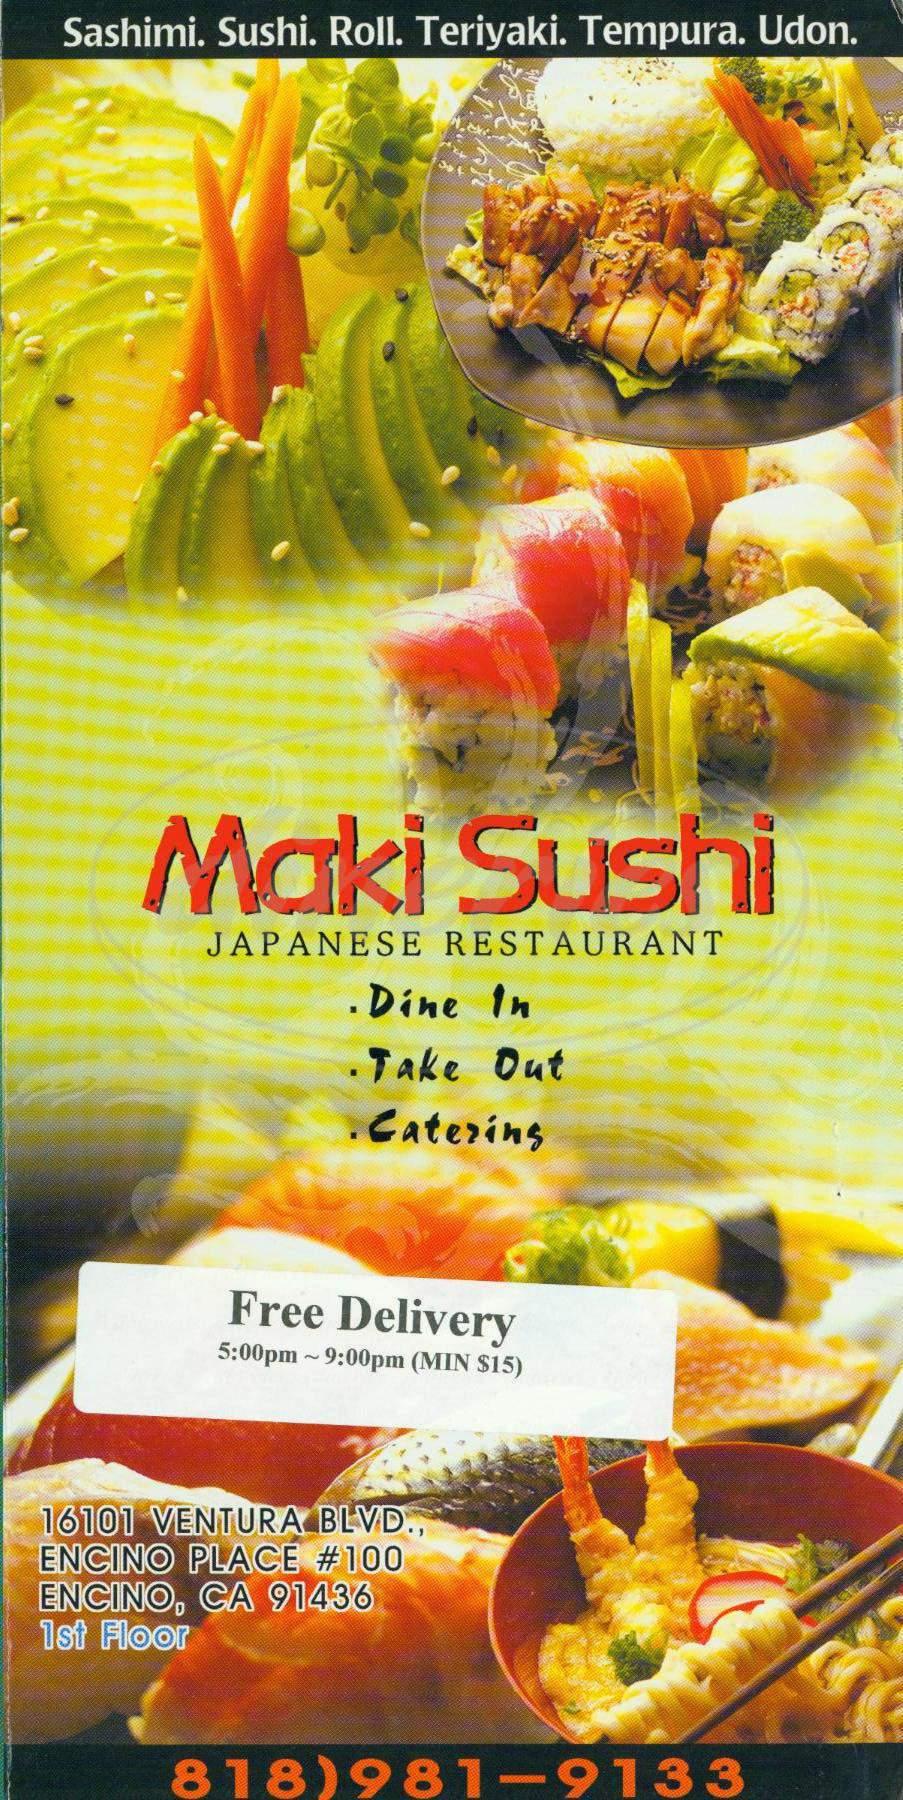 menu for Maki Sushi